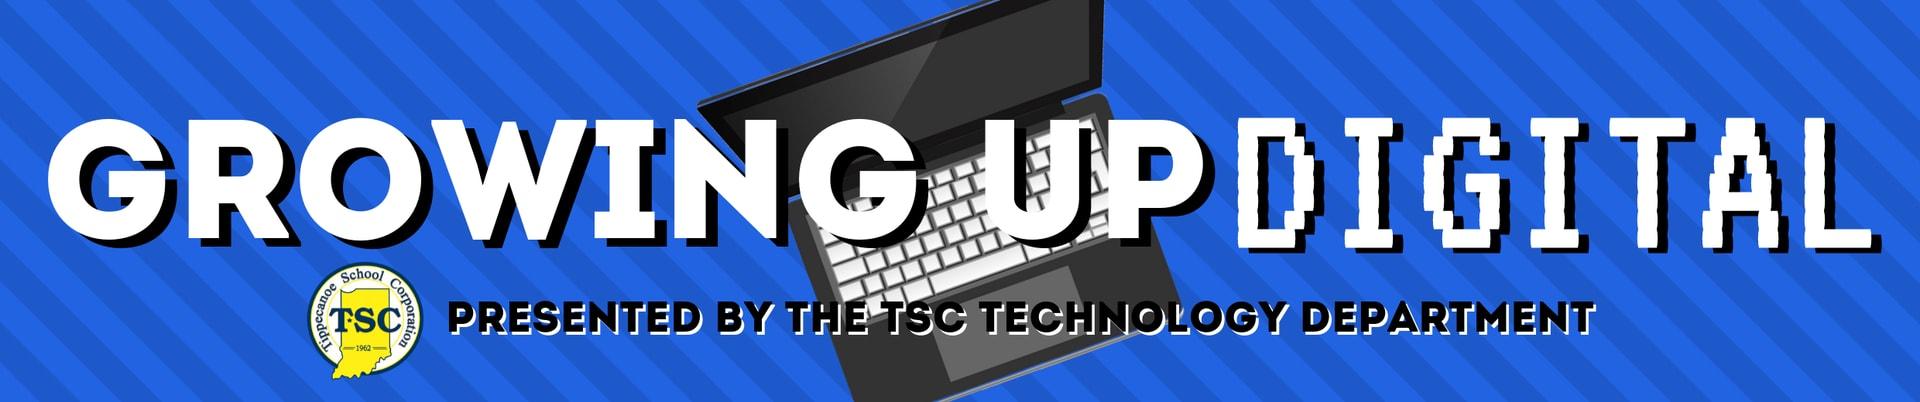 Growing Up Digital TSC logo